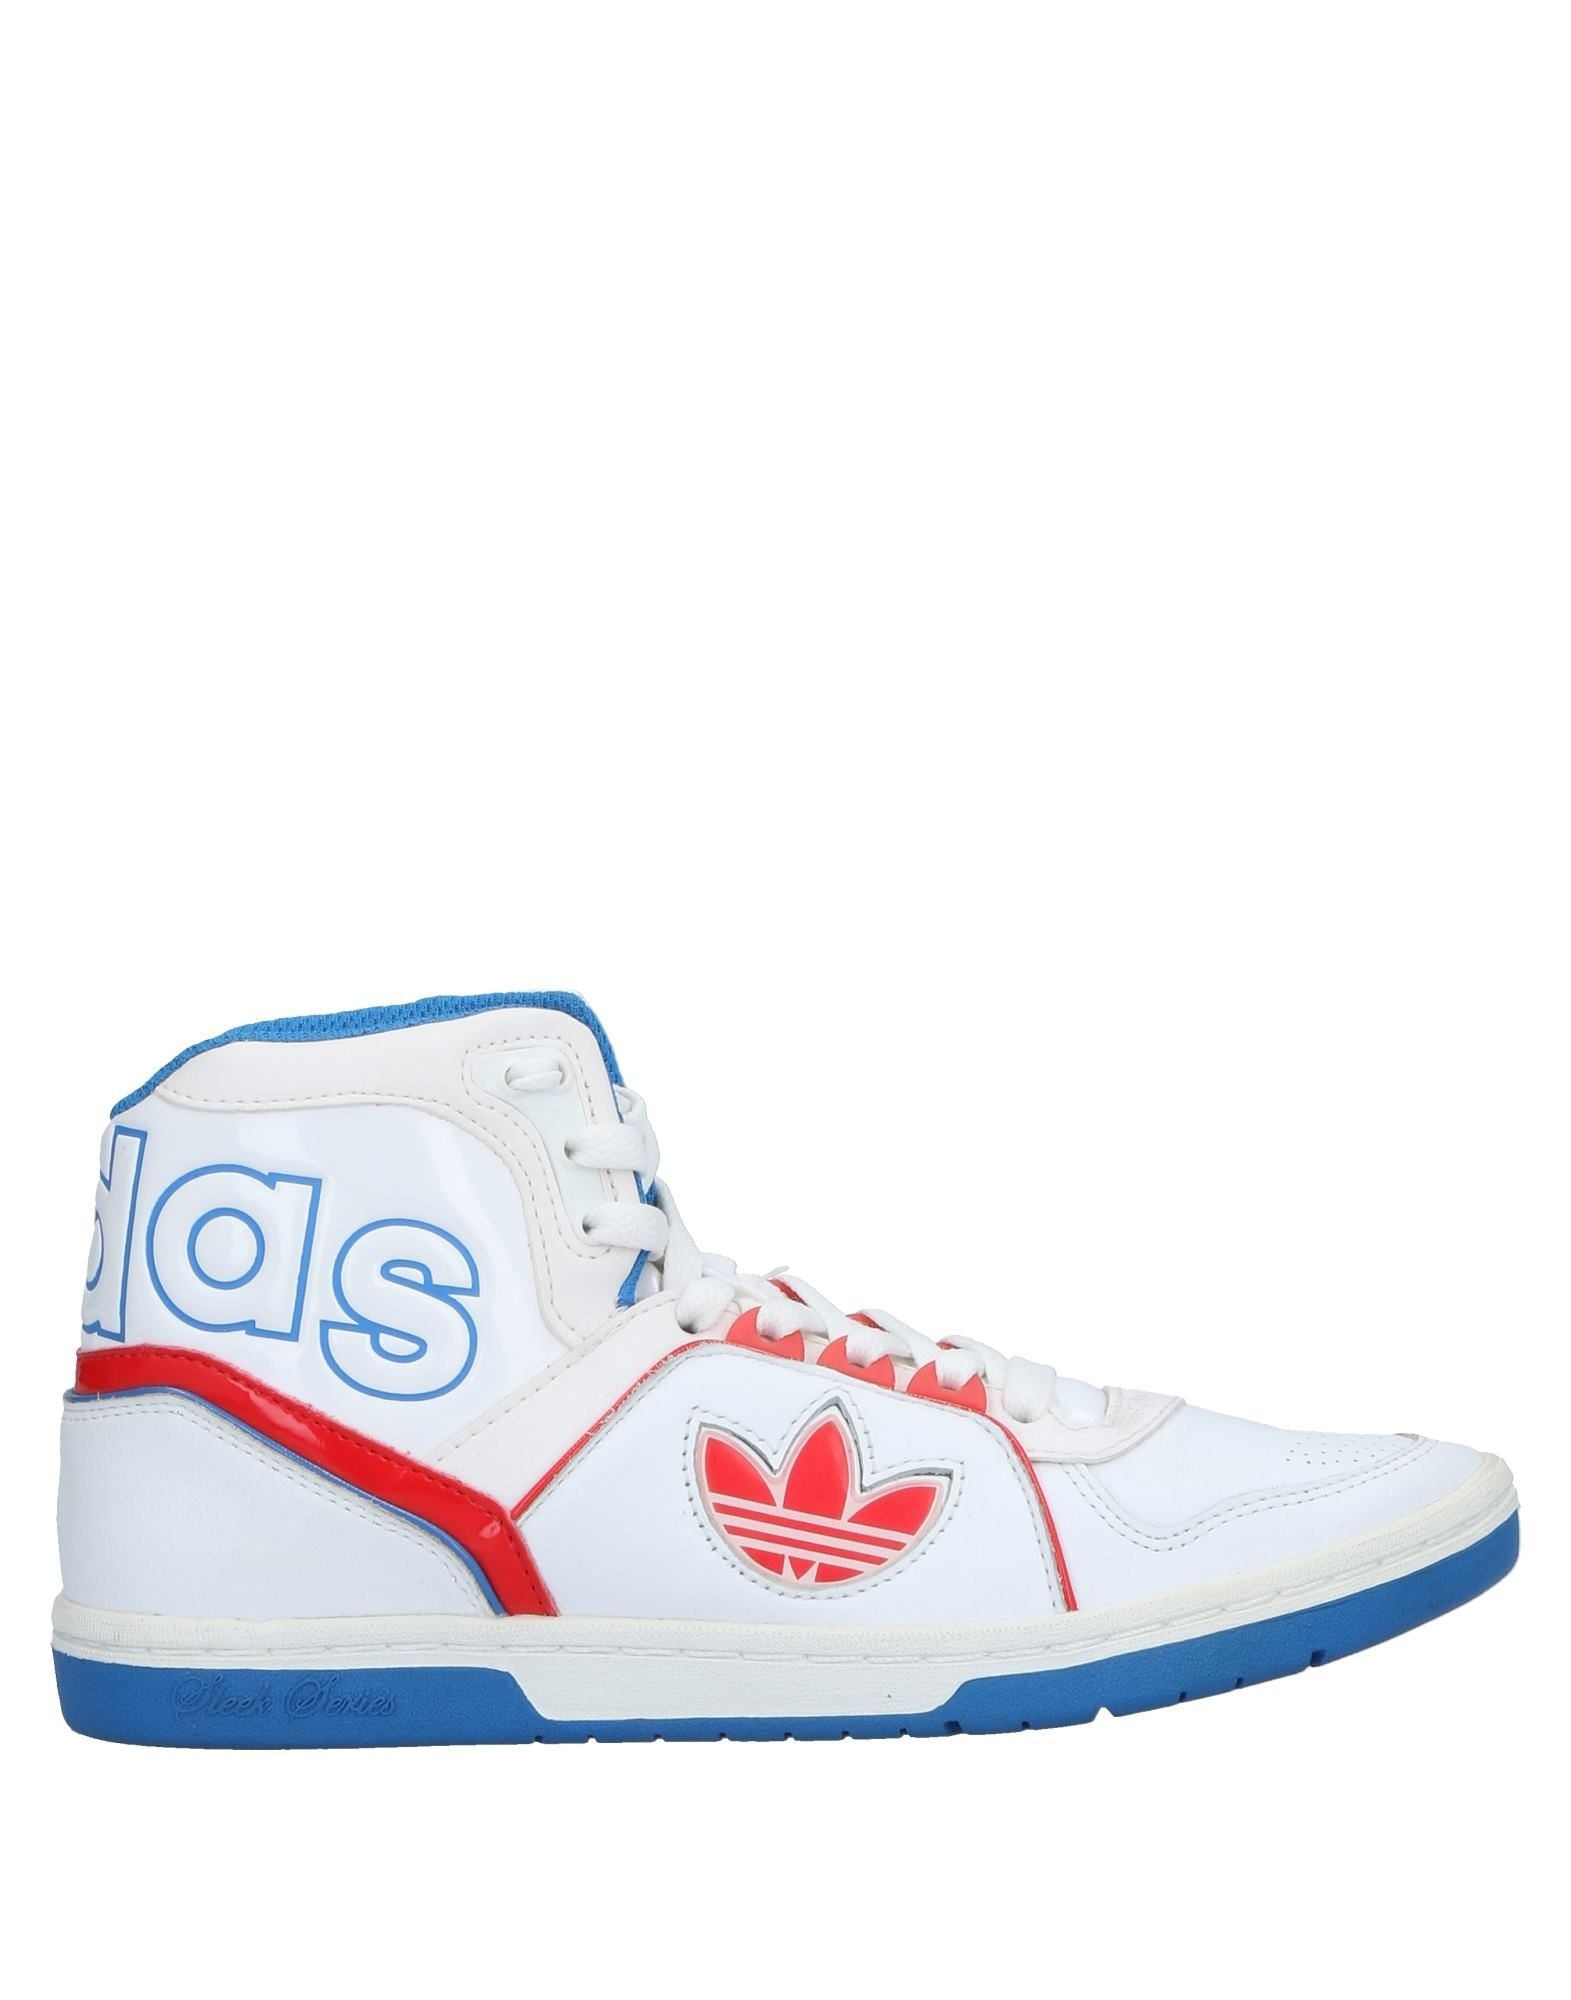 Adidas Originals Sneakers Damen  11522706WE Gute Qualität beliebte Schuhe